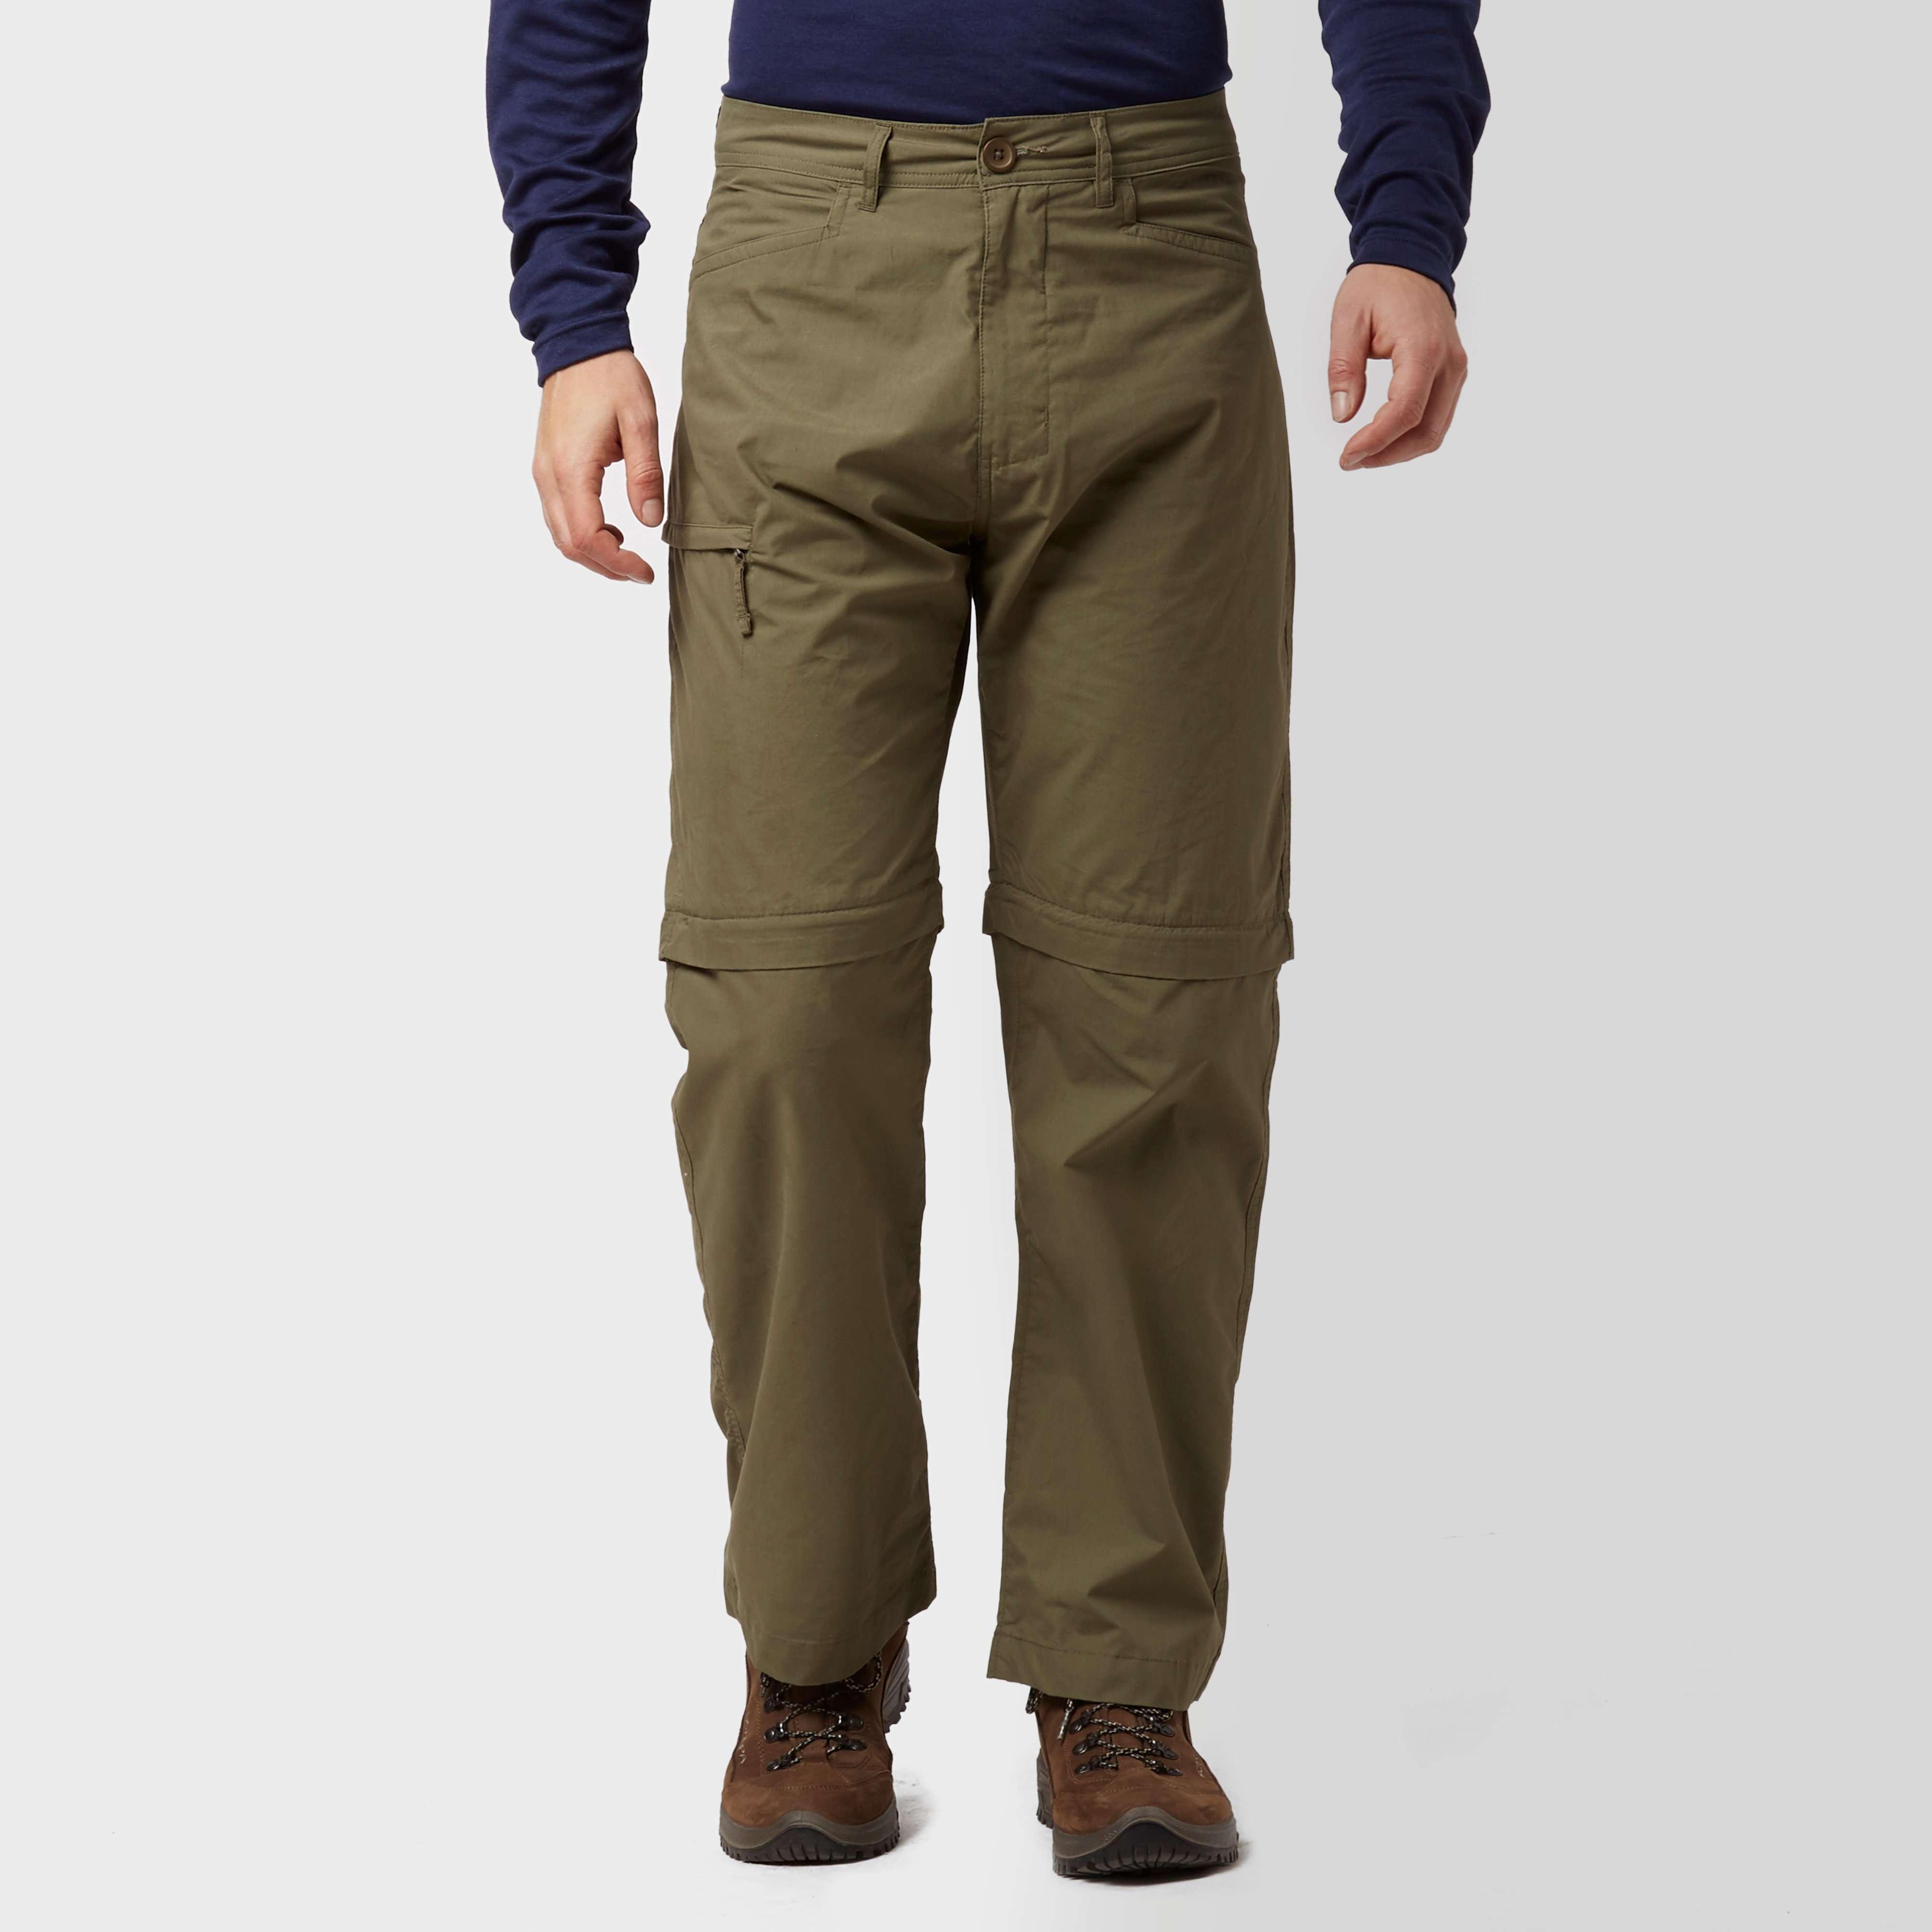 PETER STORM Men's Ramble Convertible Trousers - Short